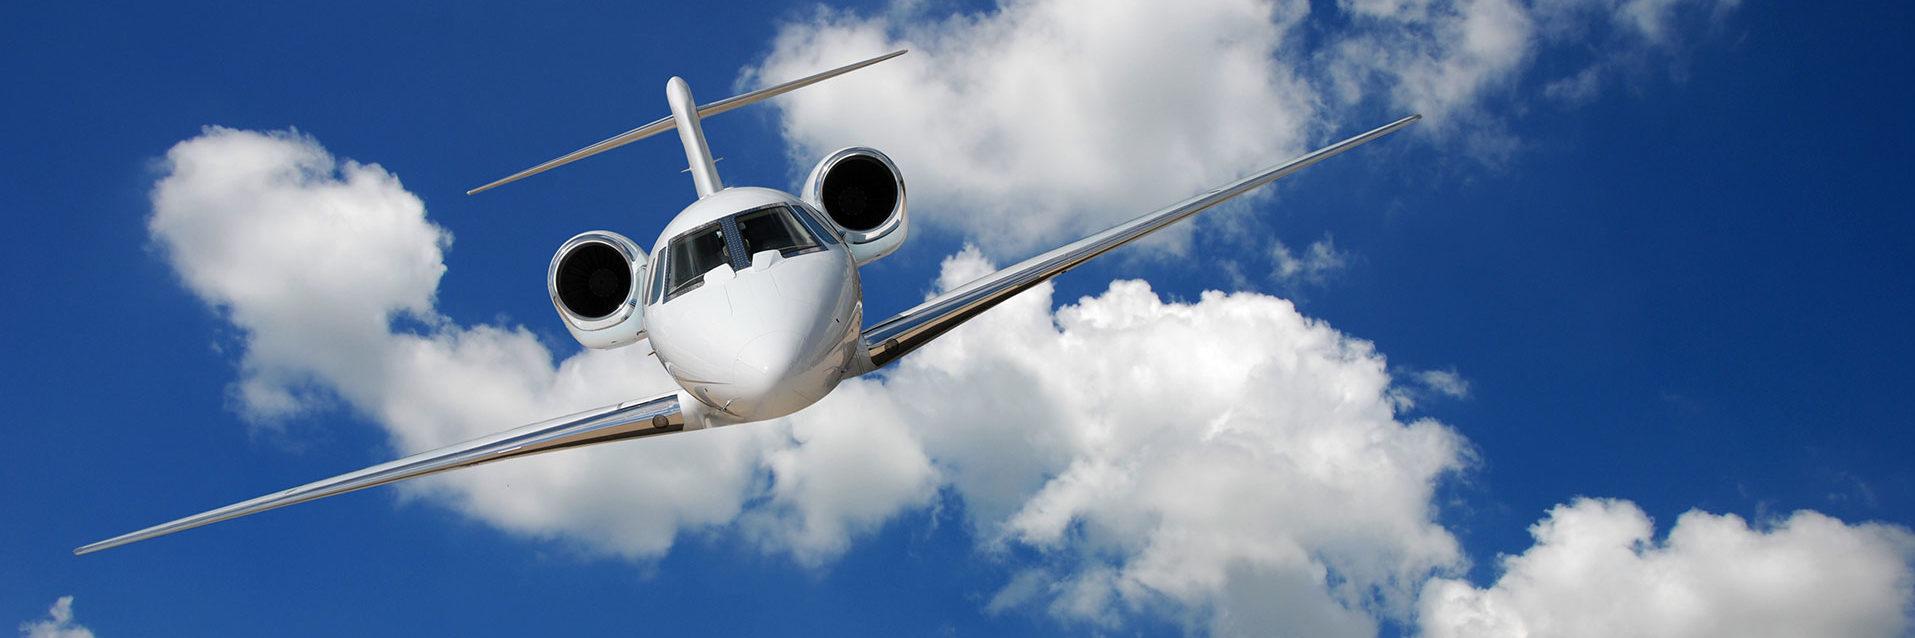 High Flight Academy – Flight School Lessons in Pittsburgh